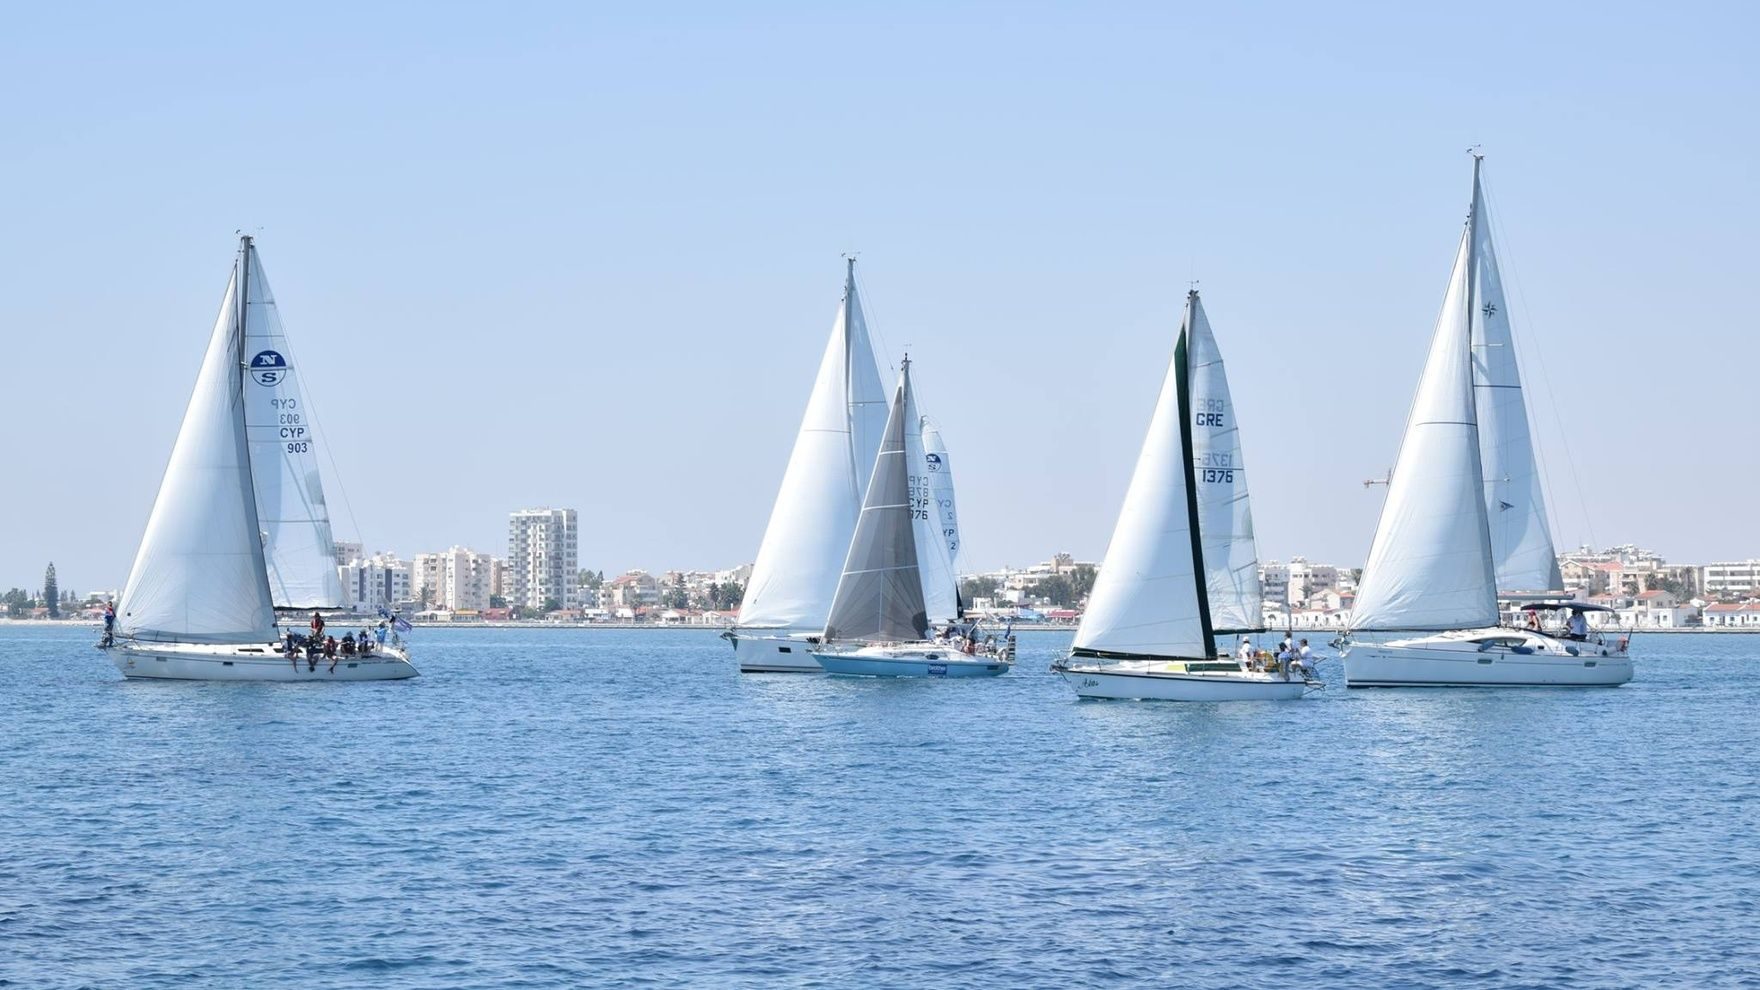 Kataklysmos Larnaca offshore regatta